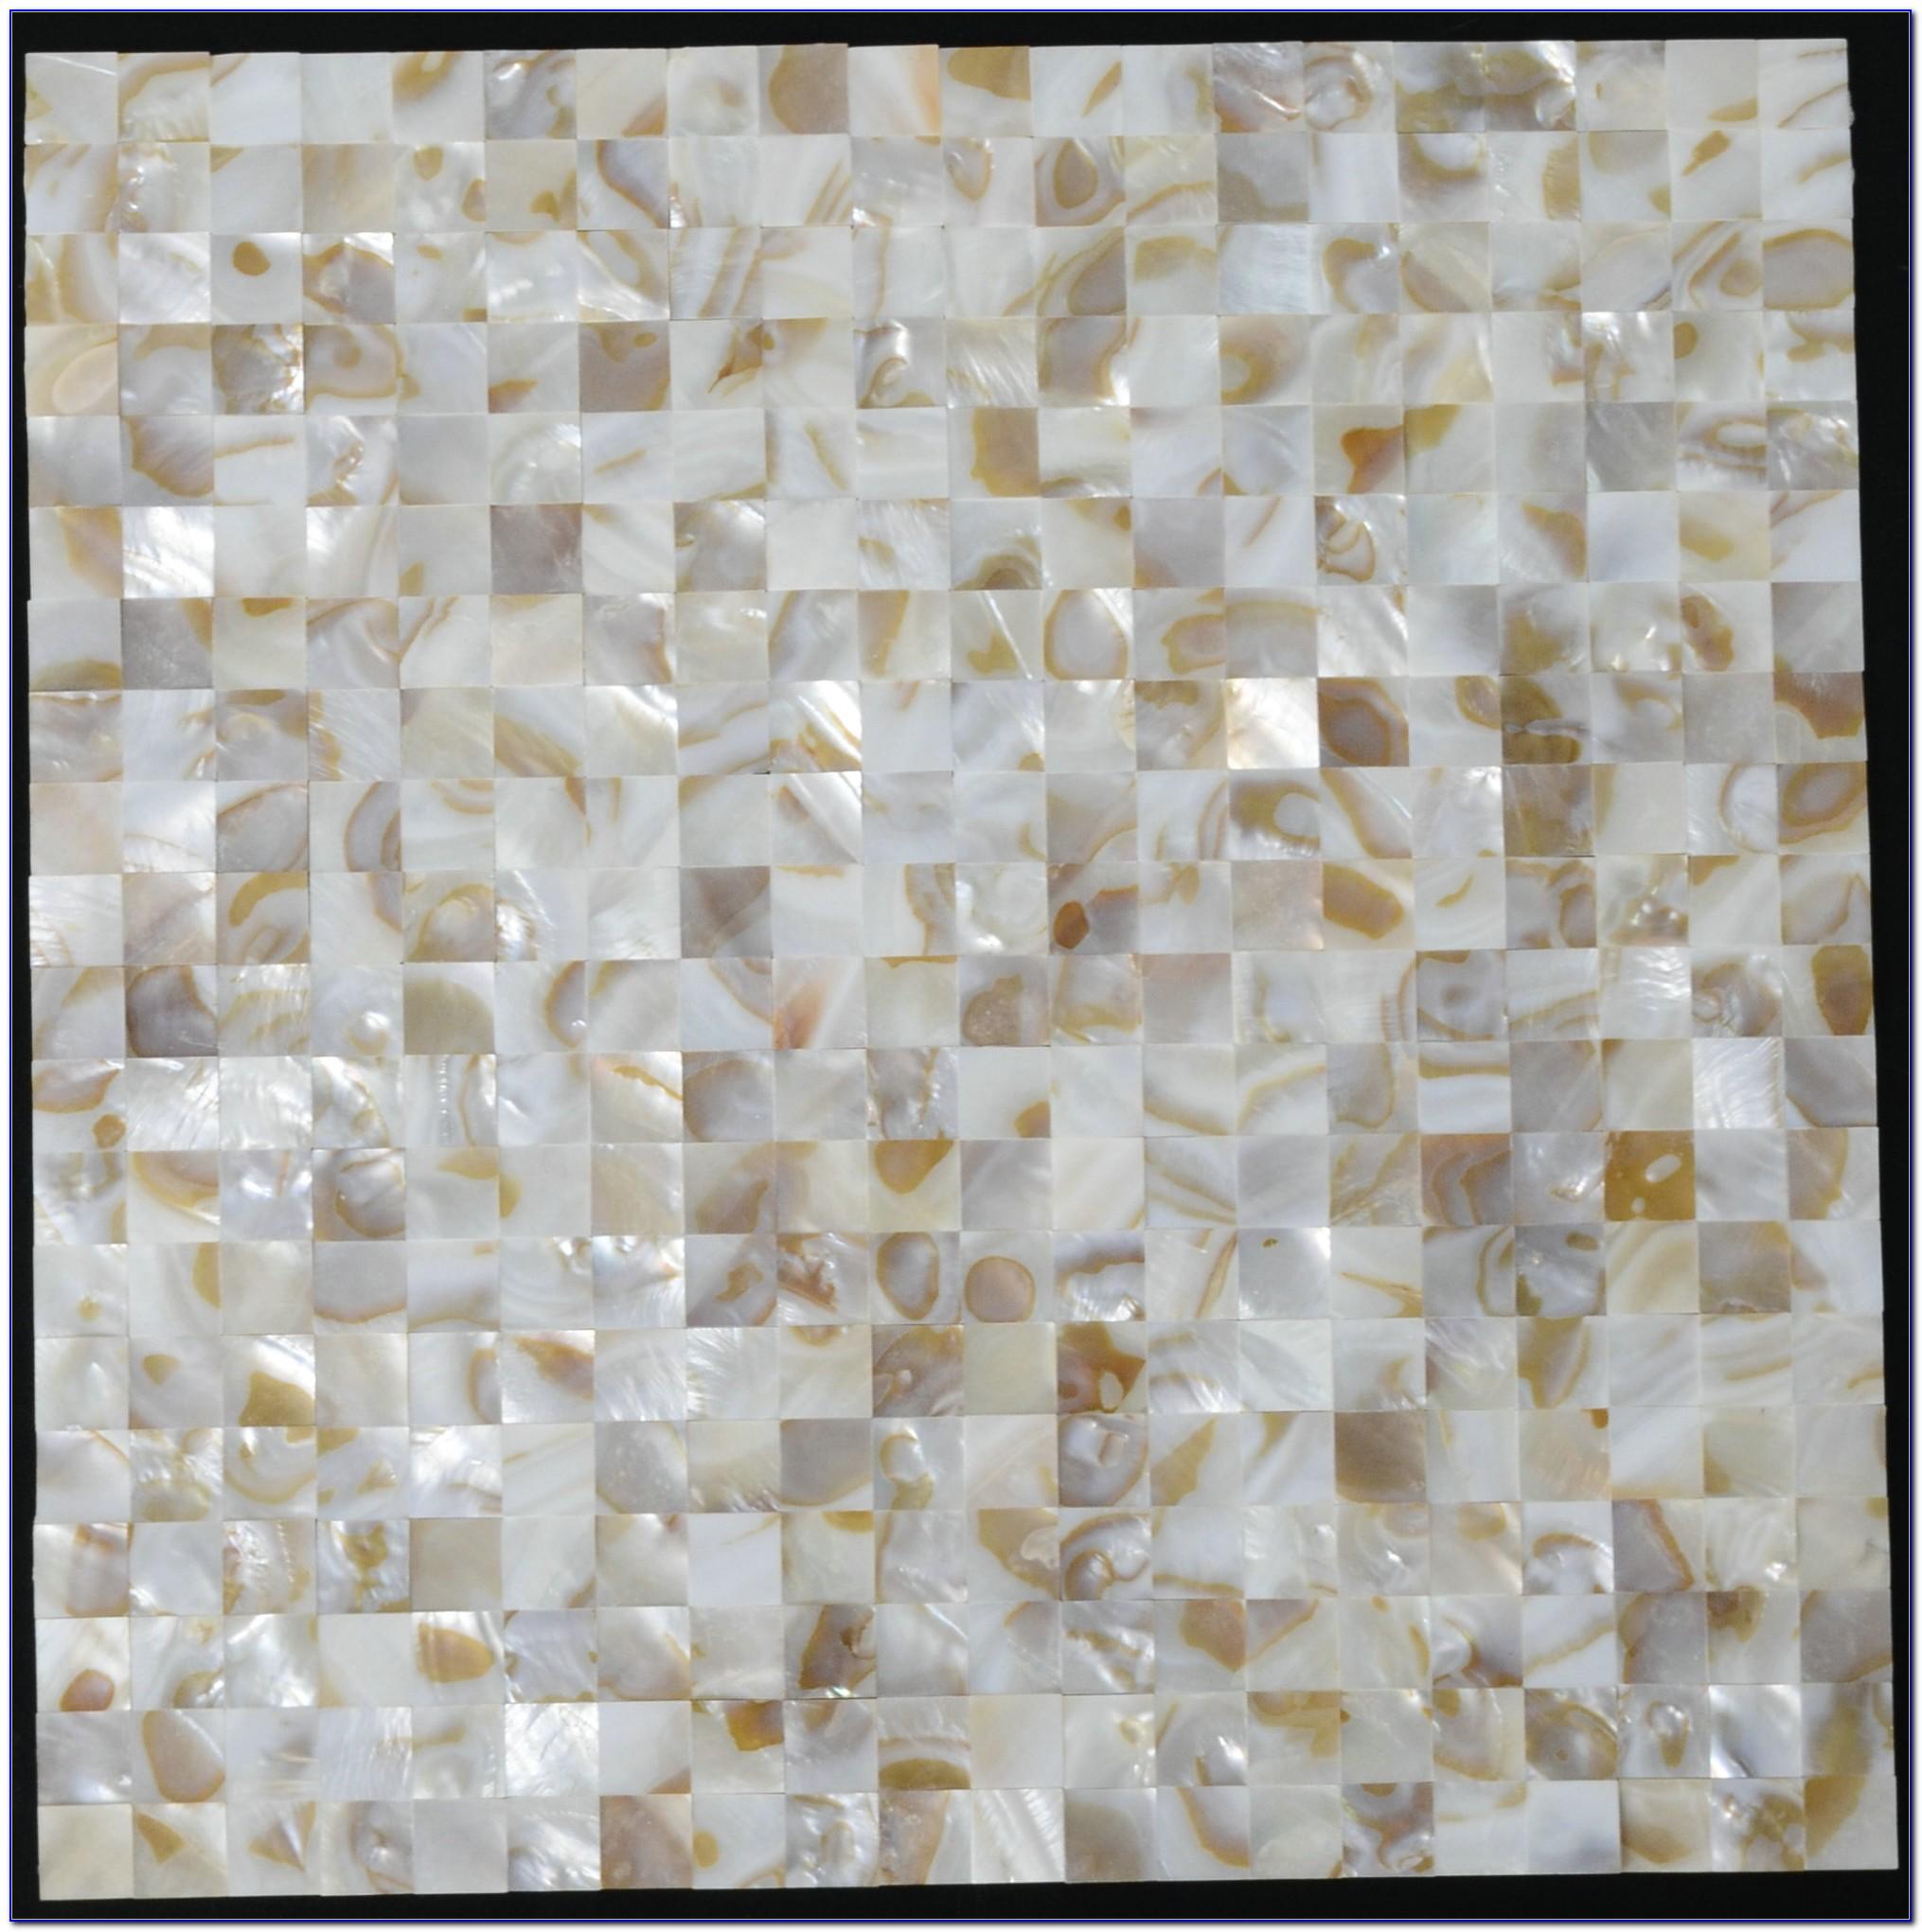 Mother Of Pearl Mosaic Tile Backsplash 12x12